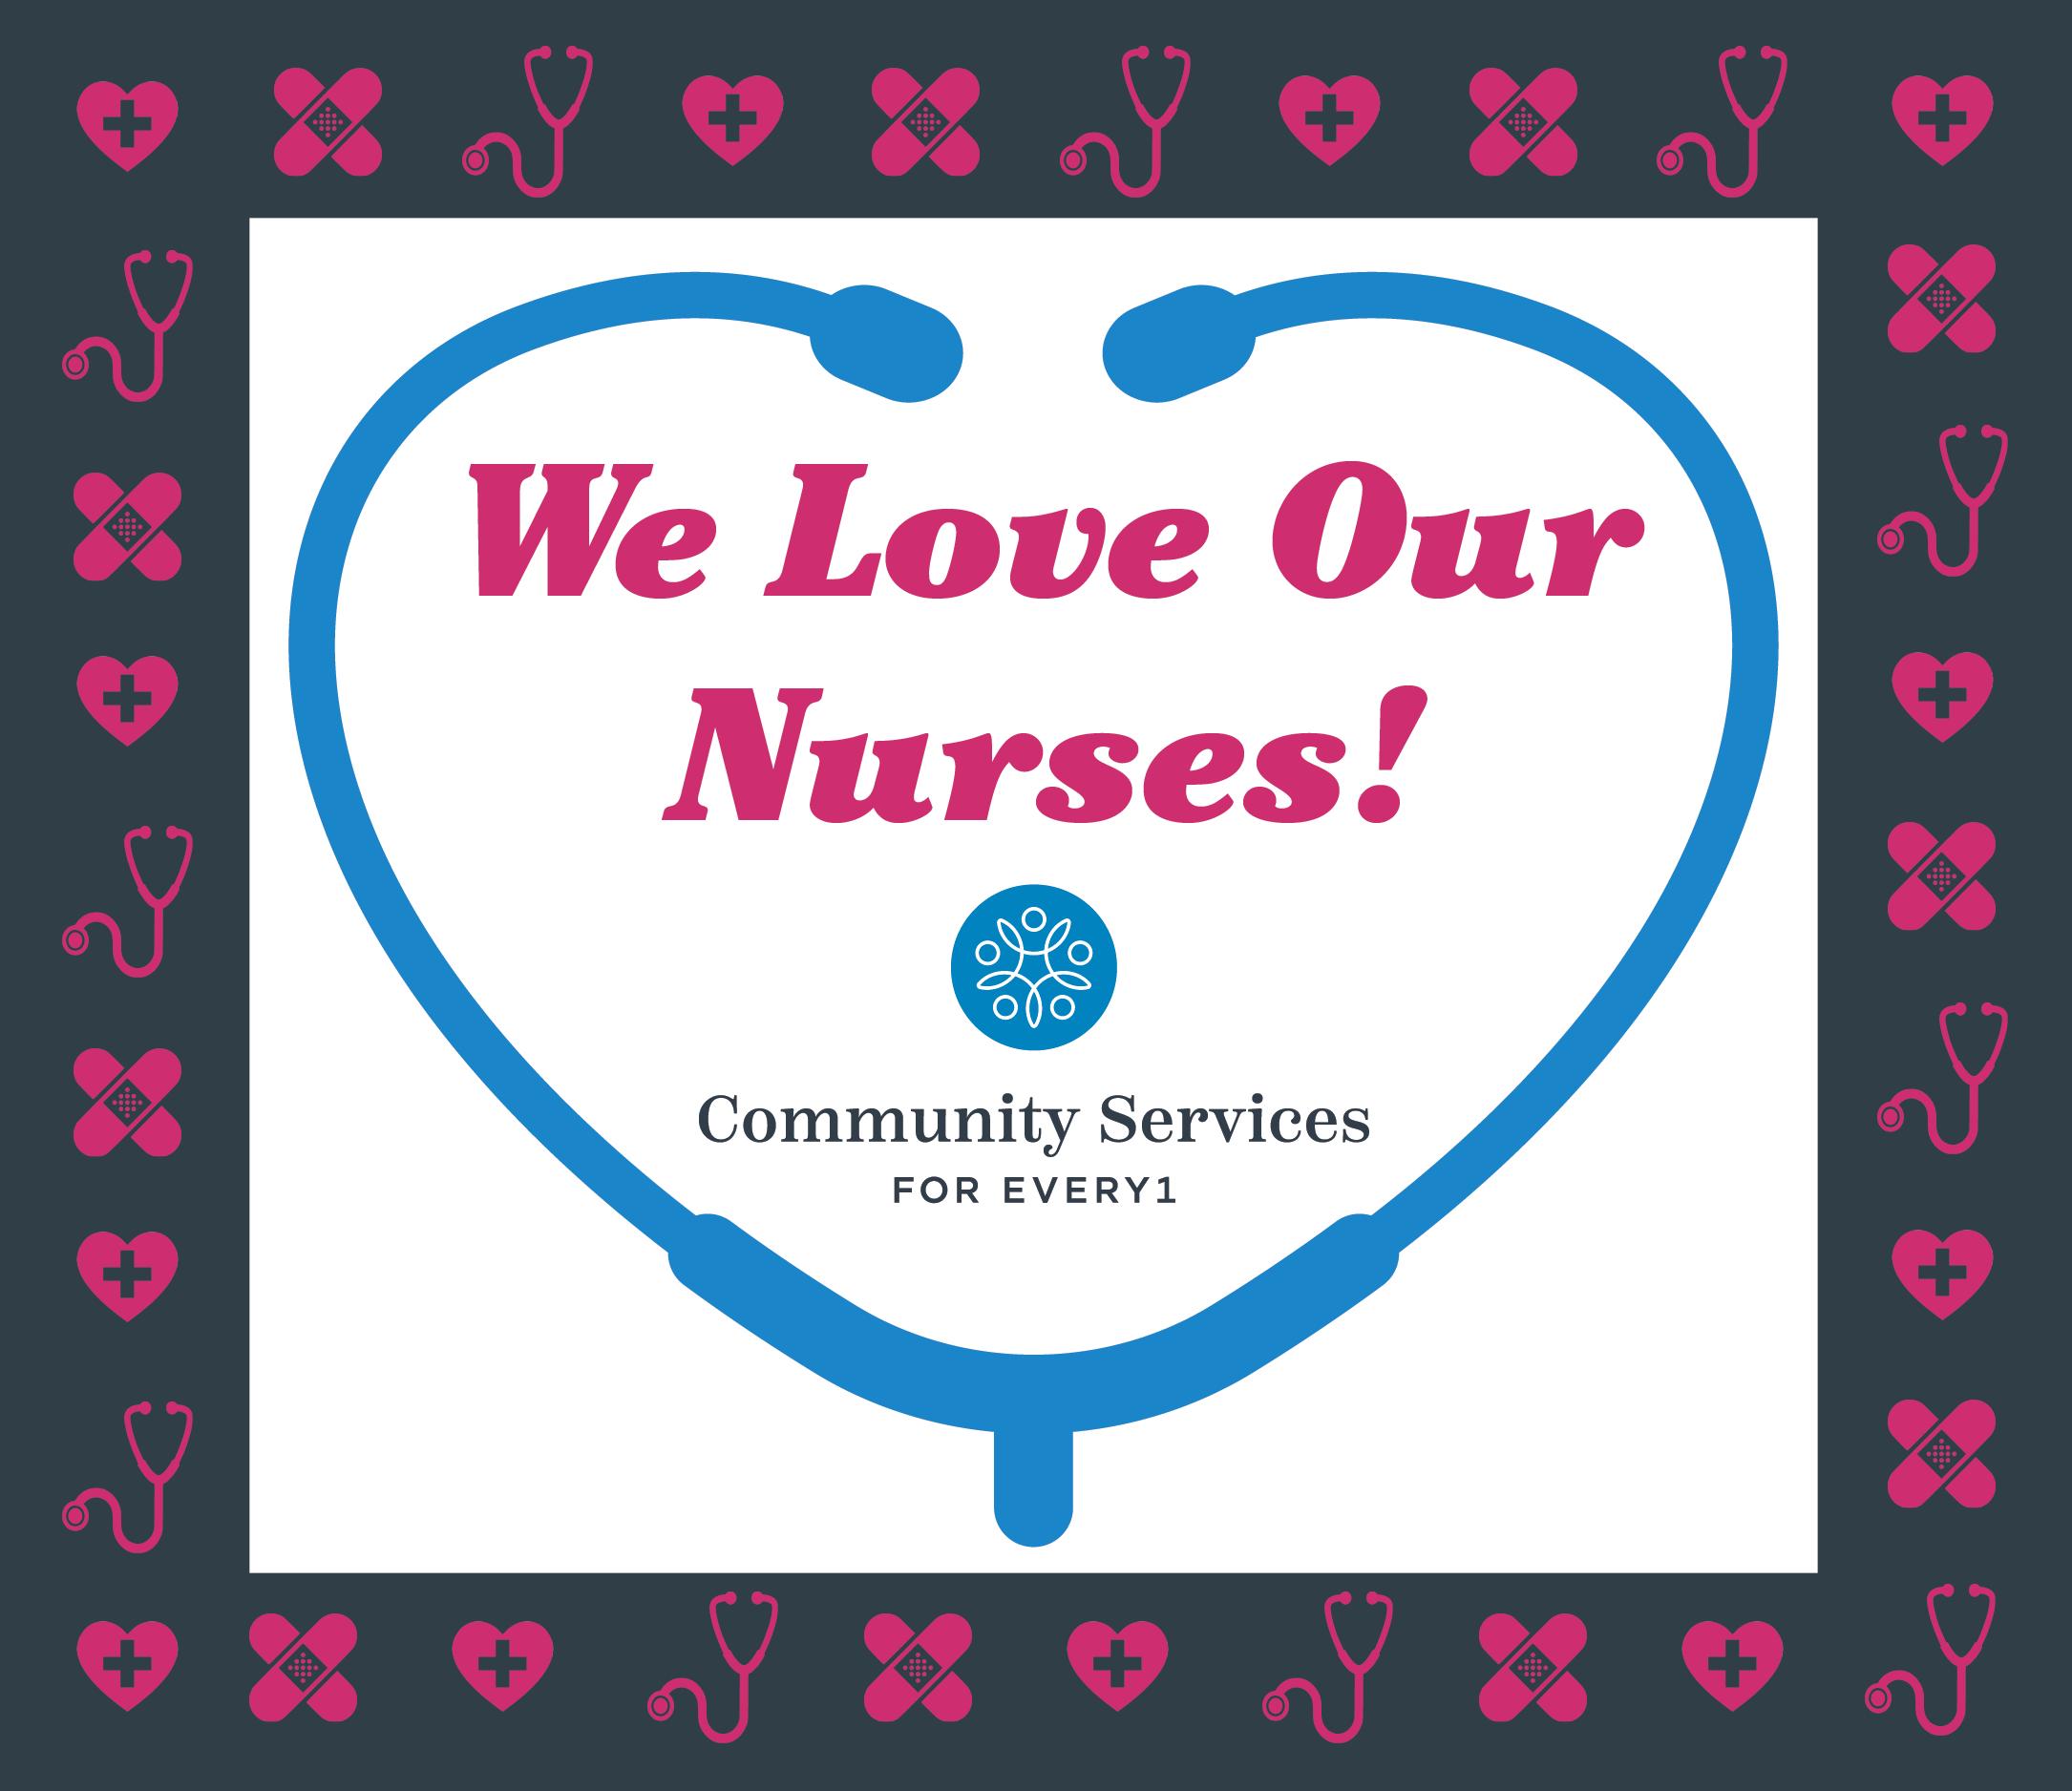 We love our Nurses social post